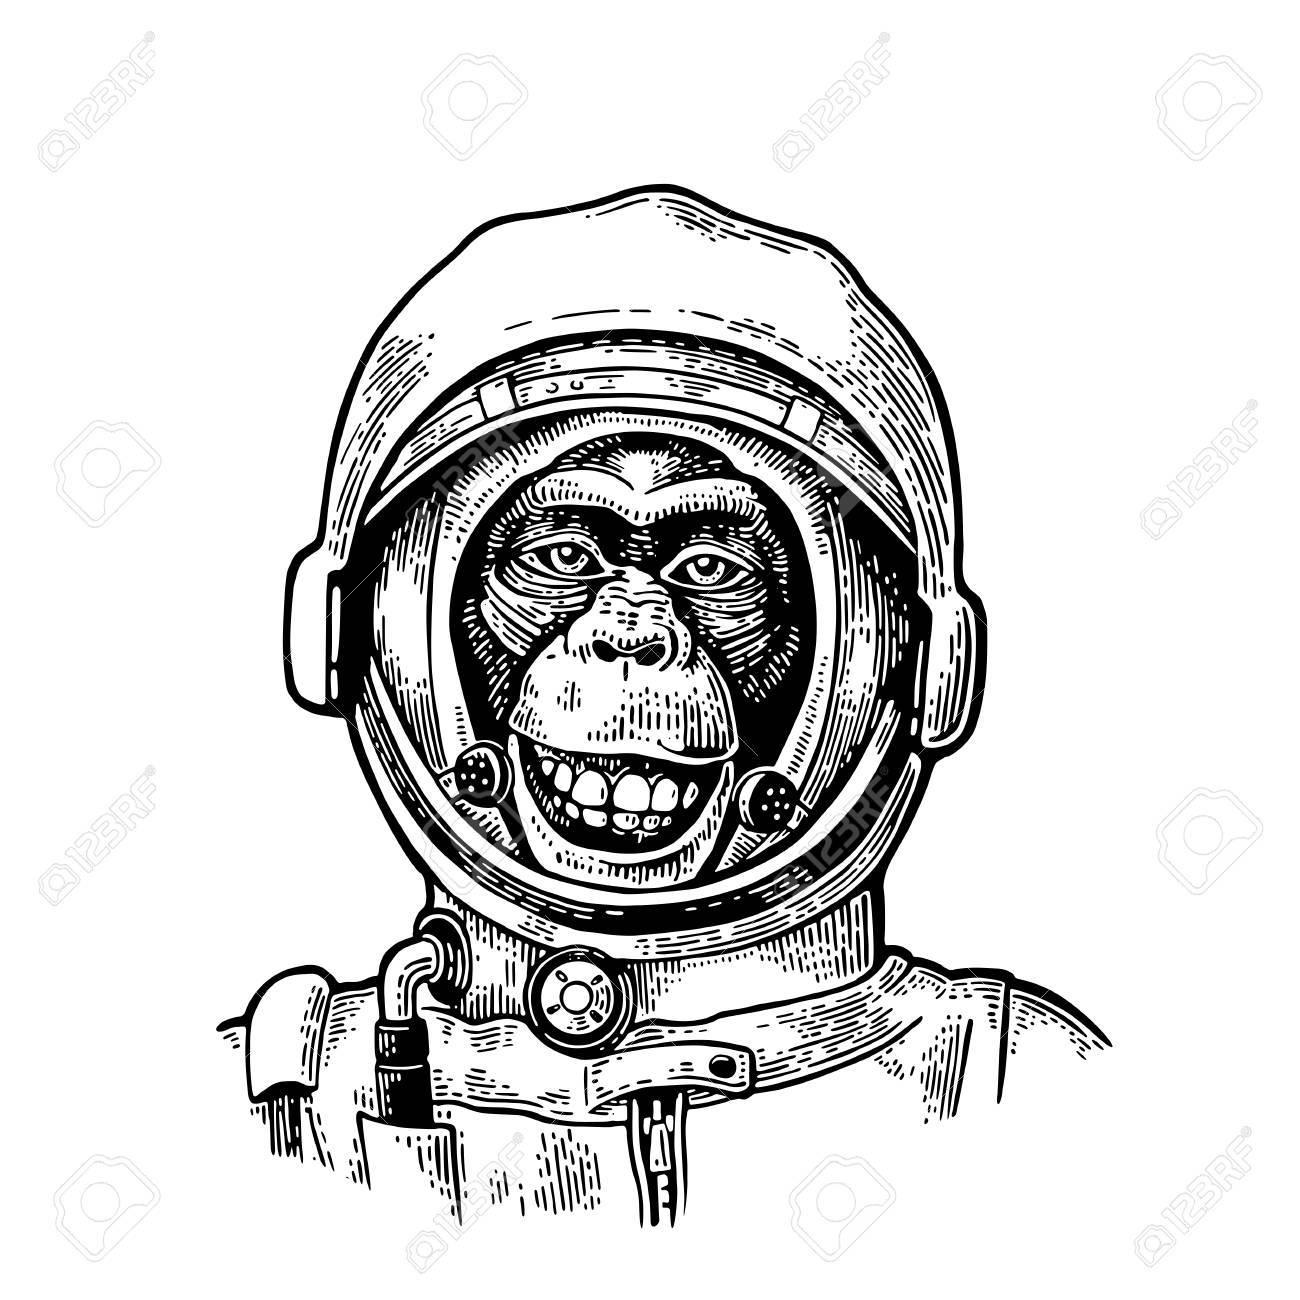 Monkey In Astronaut Helmet Vintage Black Engraving Stock Vector